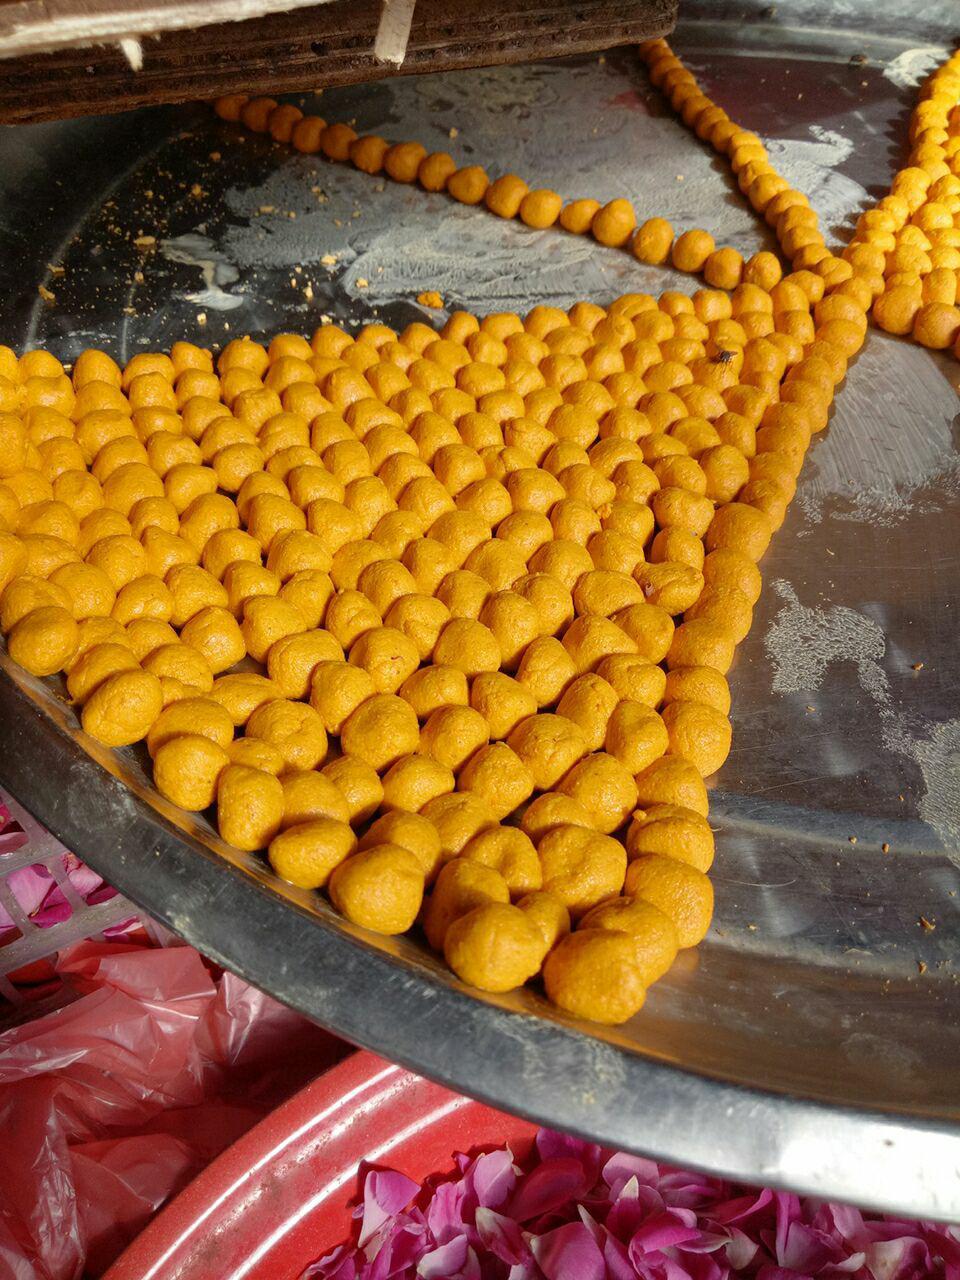 Bedak beras kunyit kecantikan tradisional Untuk yang berjerawat